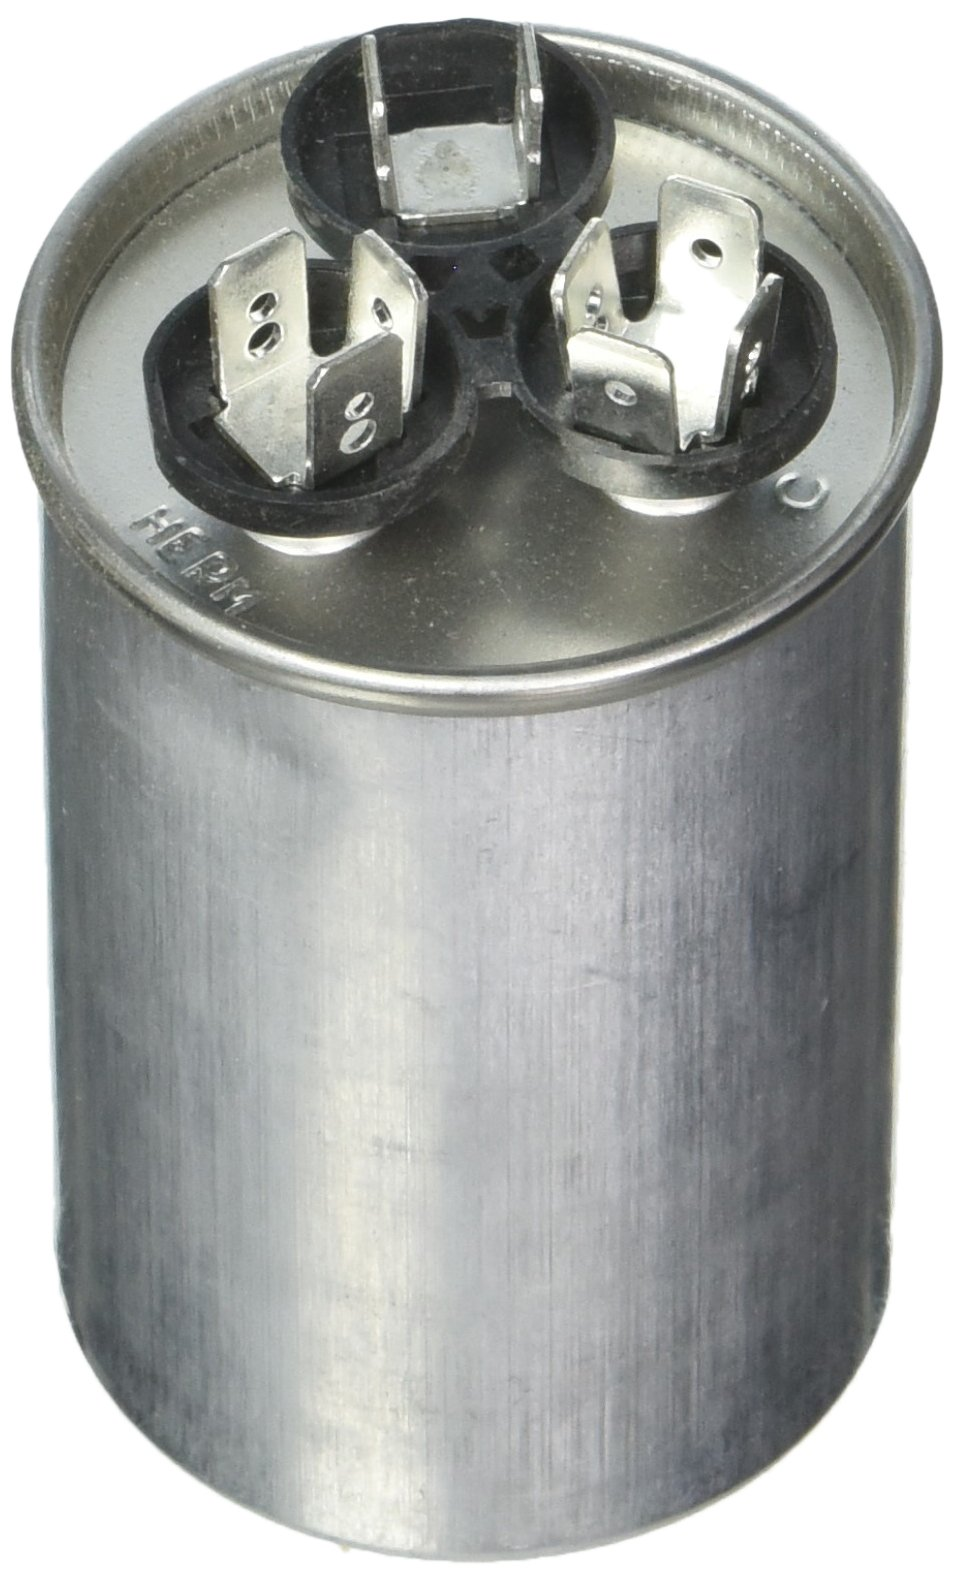 Dometic 3313107.027 Fan Capacitor (30/50 MFD)